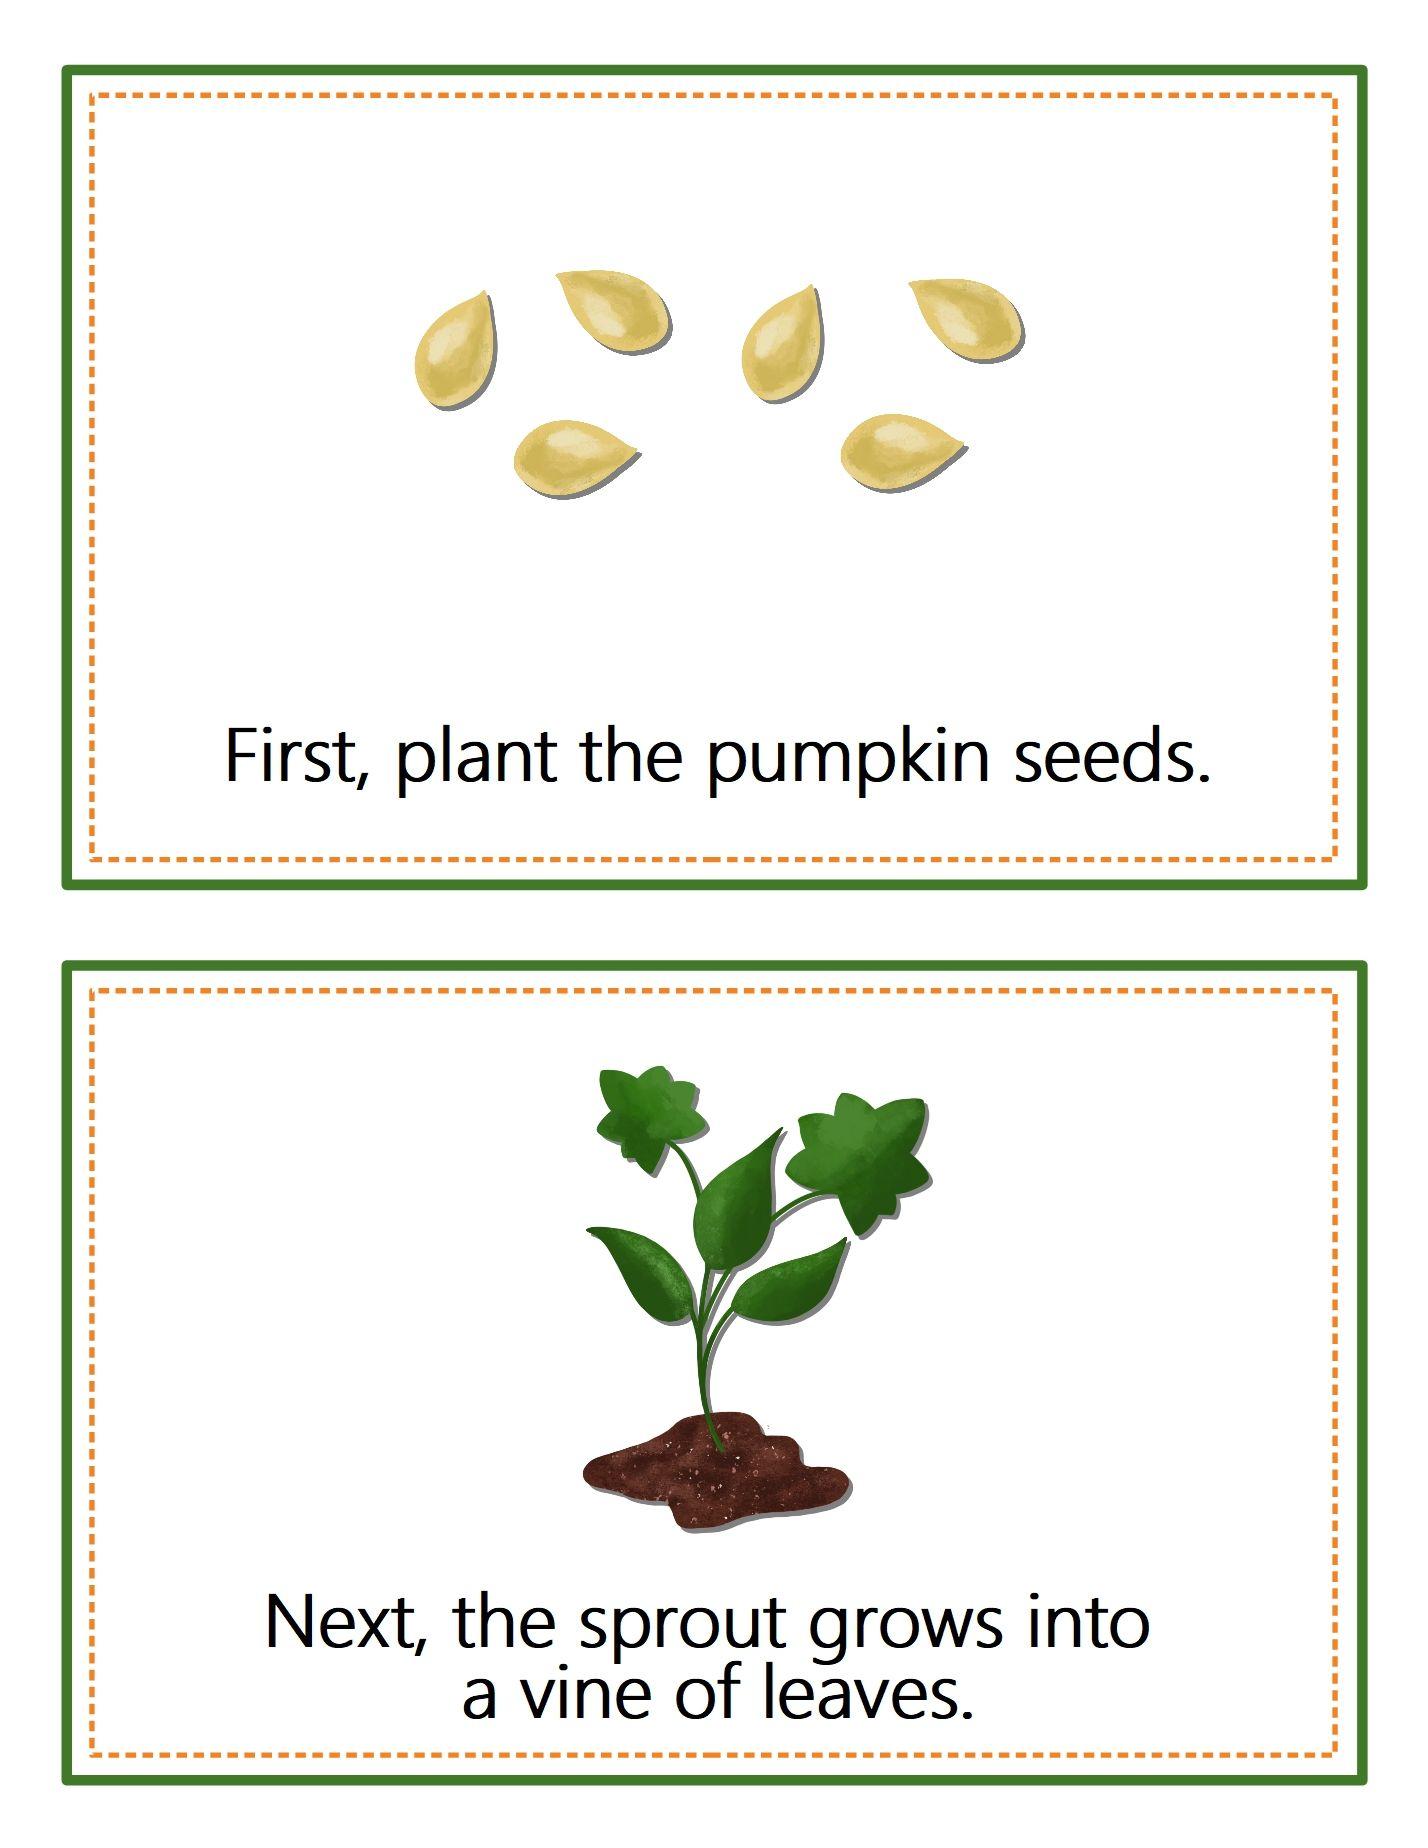 The Life Cycle Of A Pumpkin Exploring The Parts Of A Pumpkin